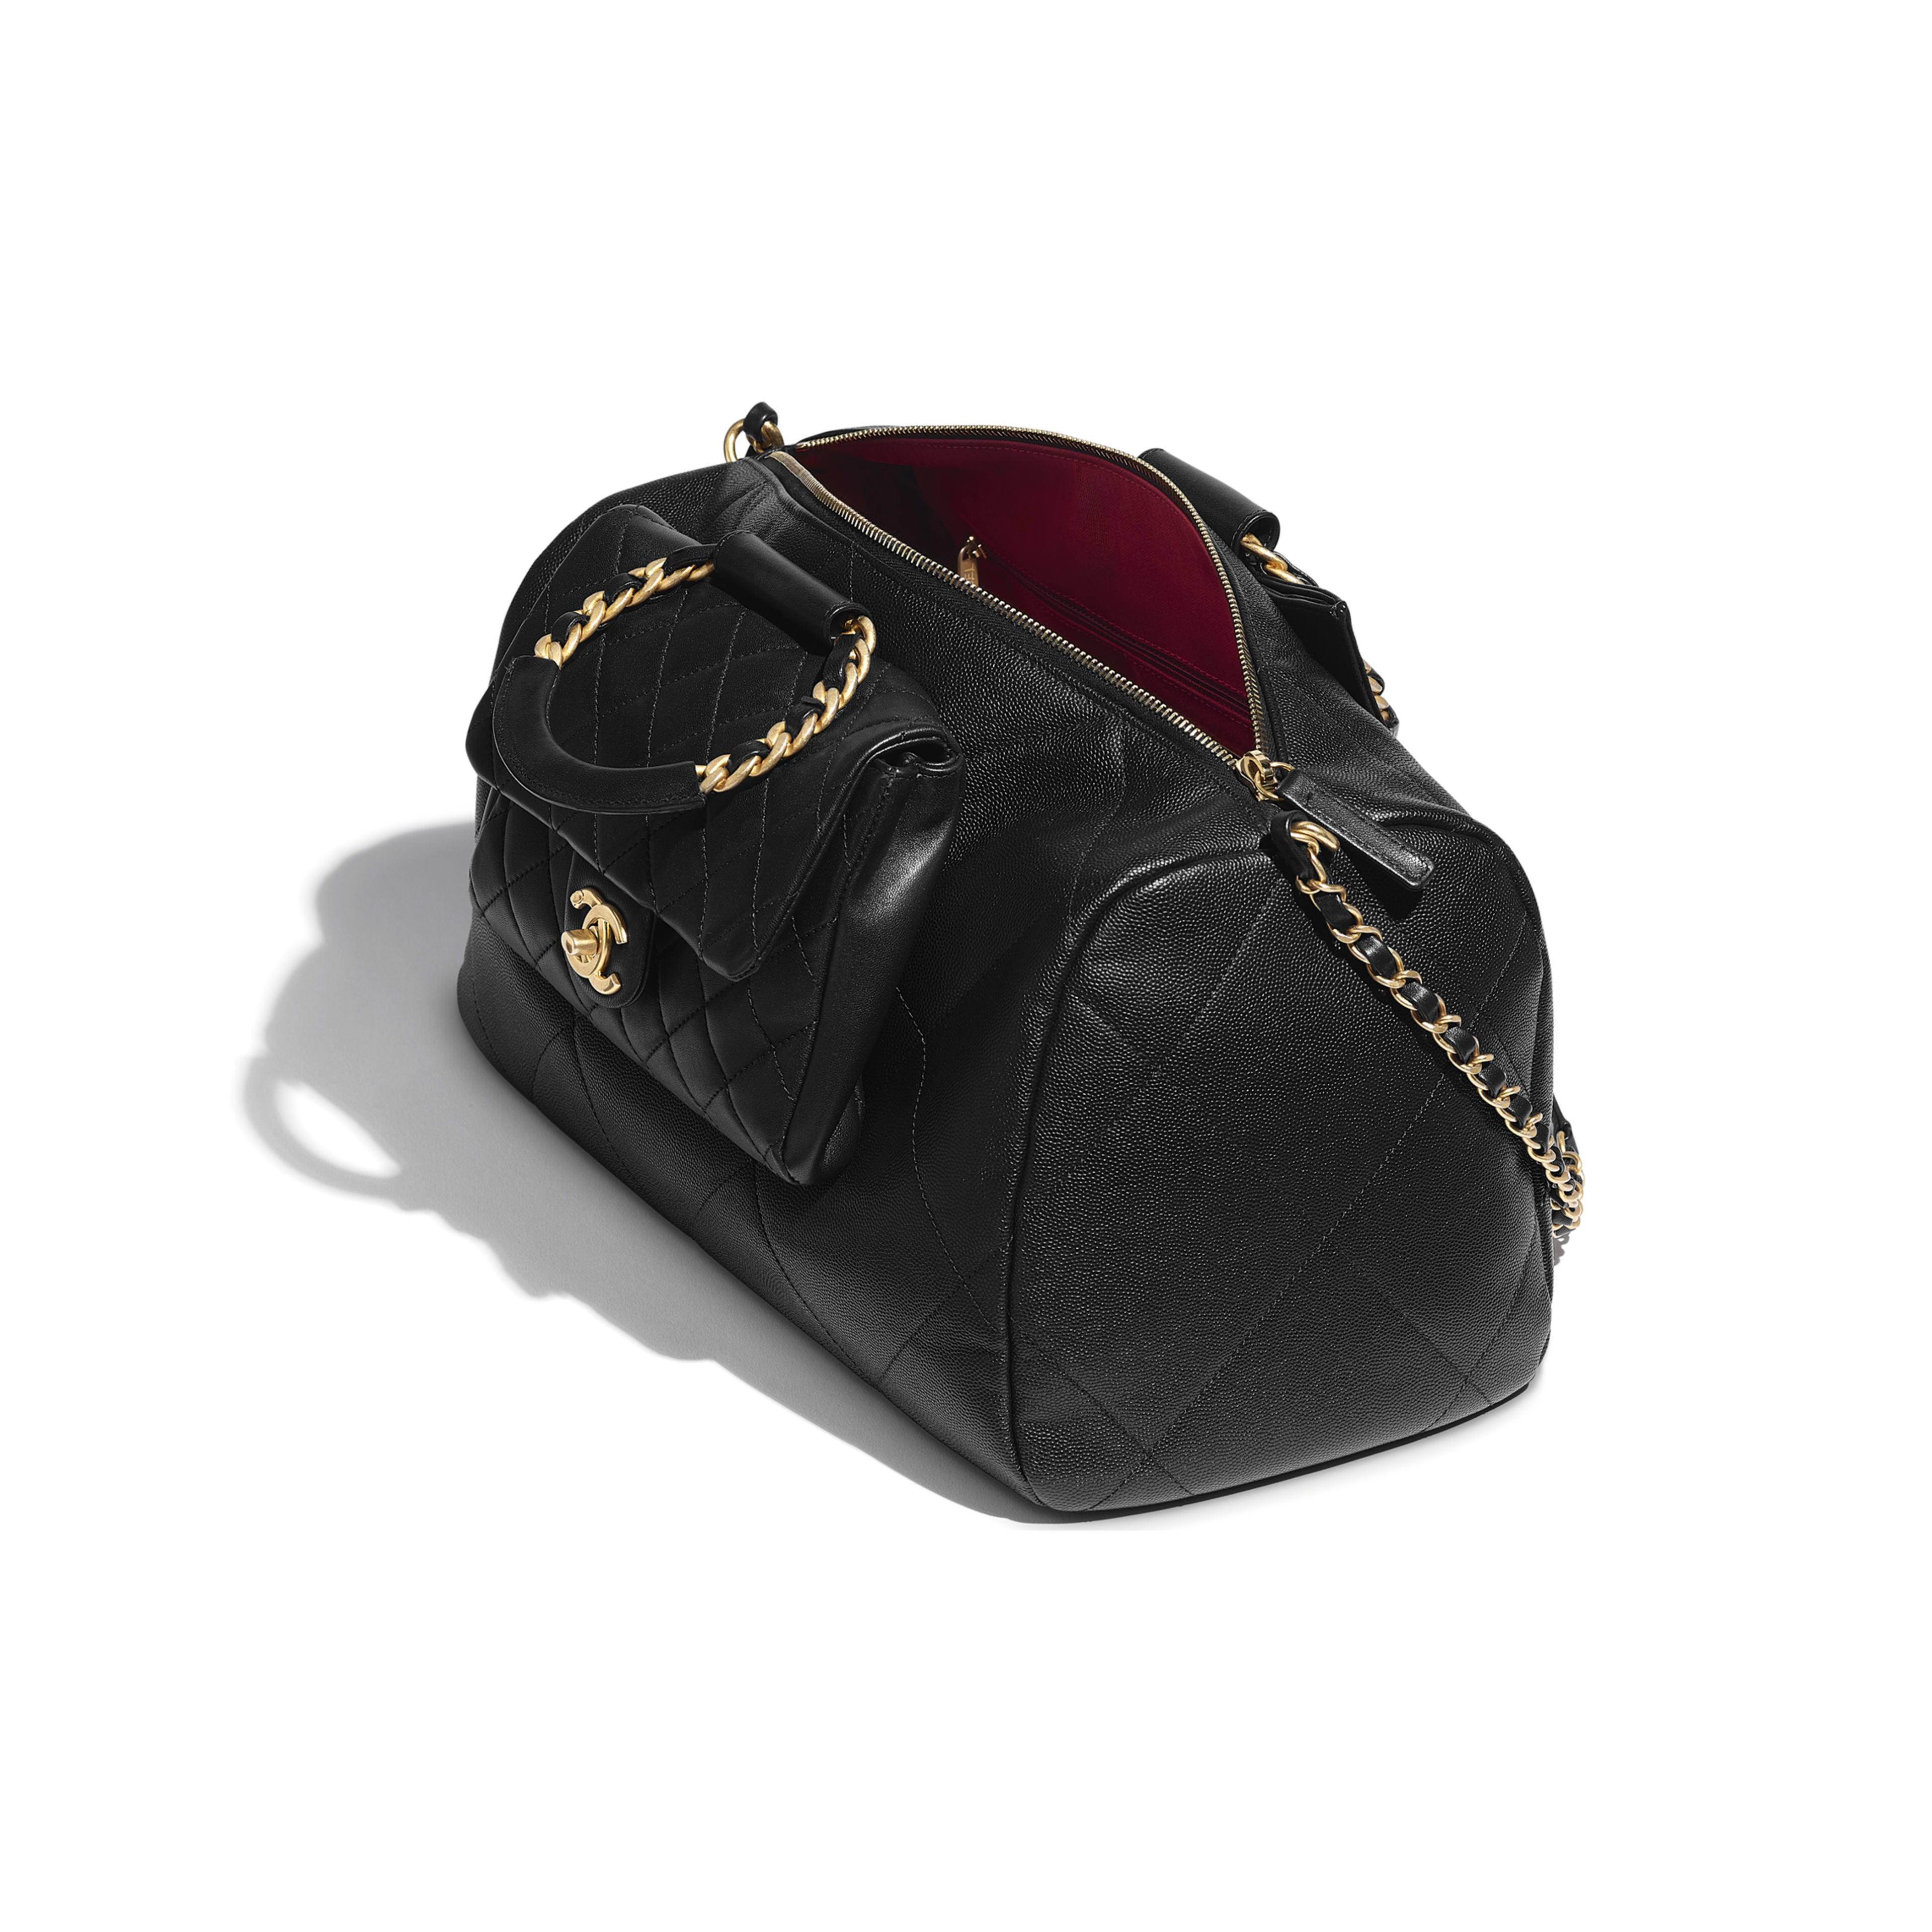 Grained Calfskin Lambskin Gold Metal Black Large Bowling Bag Chanel